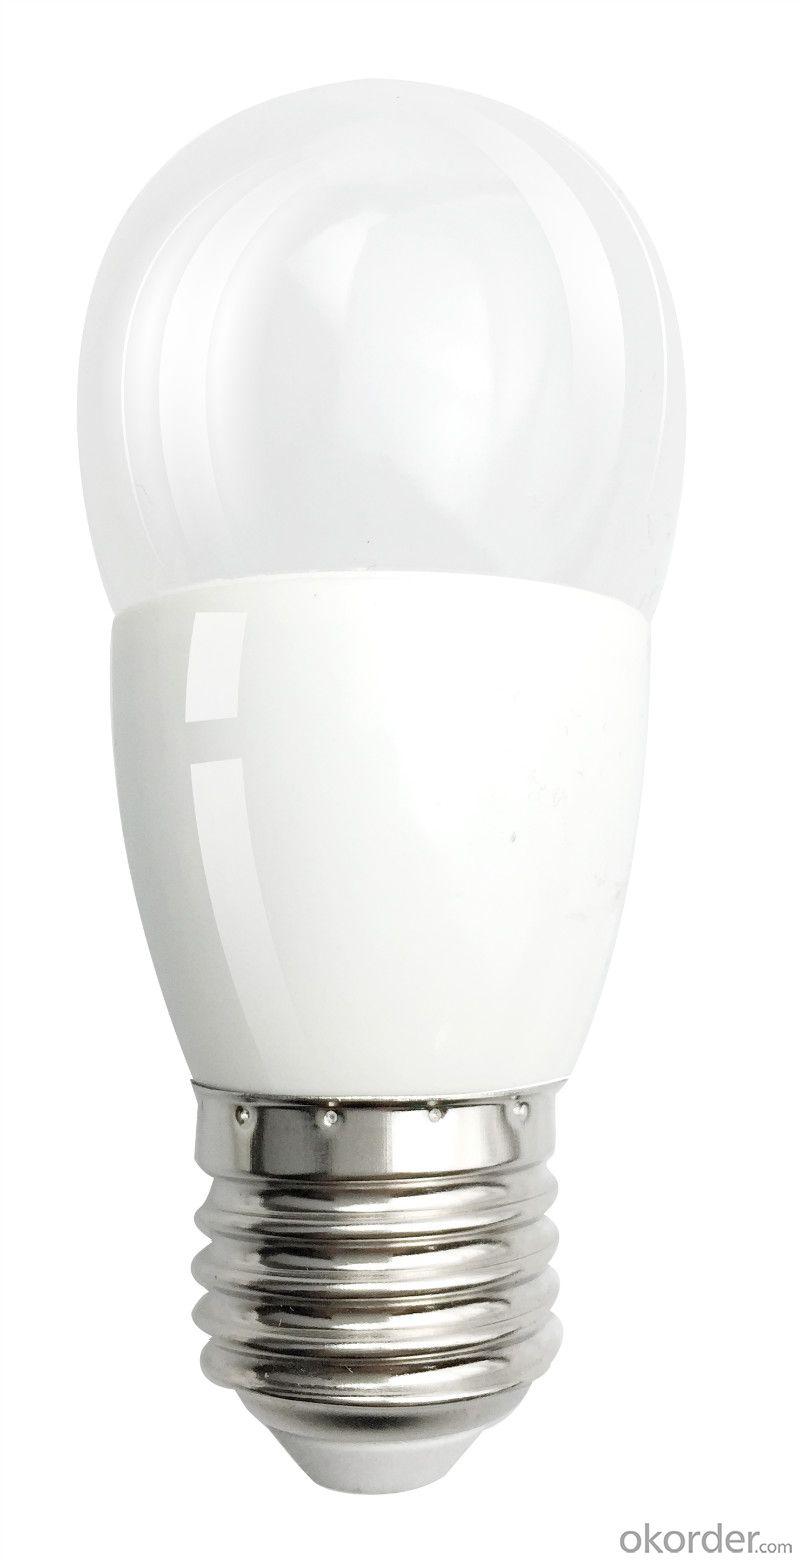 buy led bulb light e14 3000k 4000k 5000k 6500k p45 9wnon dimmable price size weight model width. Black Bedroom Furniture Sets. Home Design Ideas